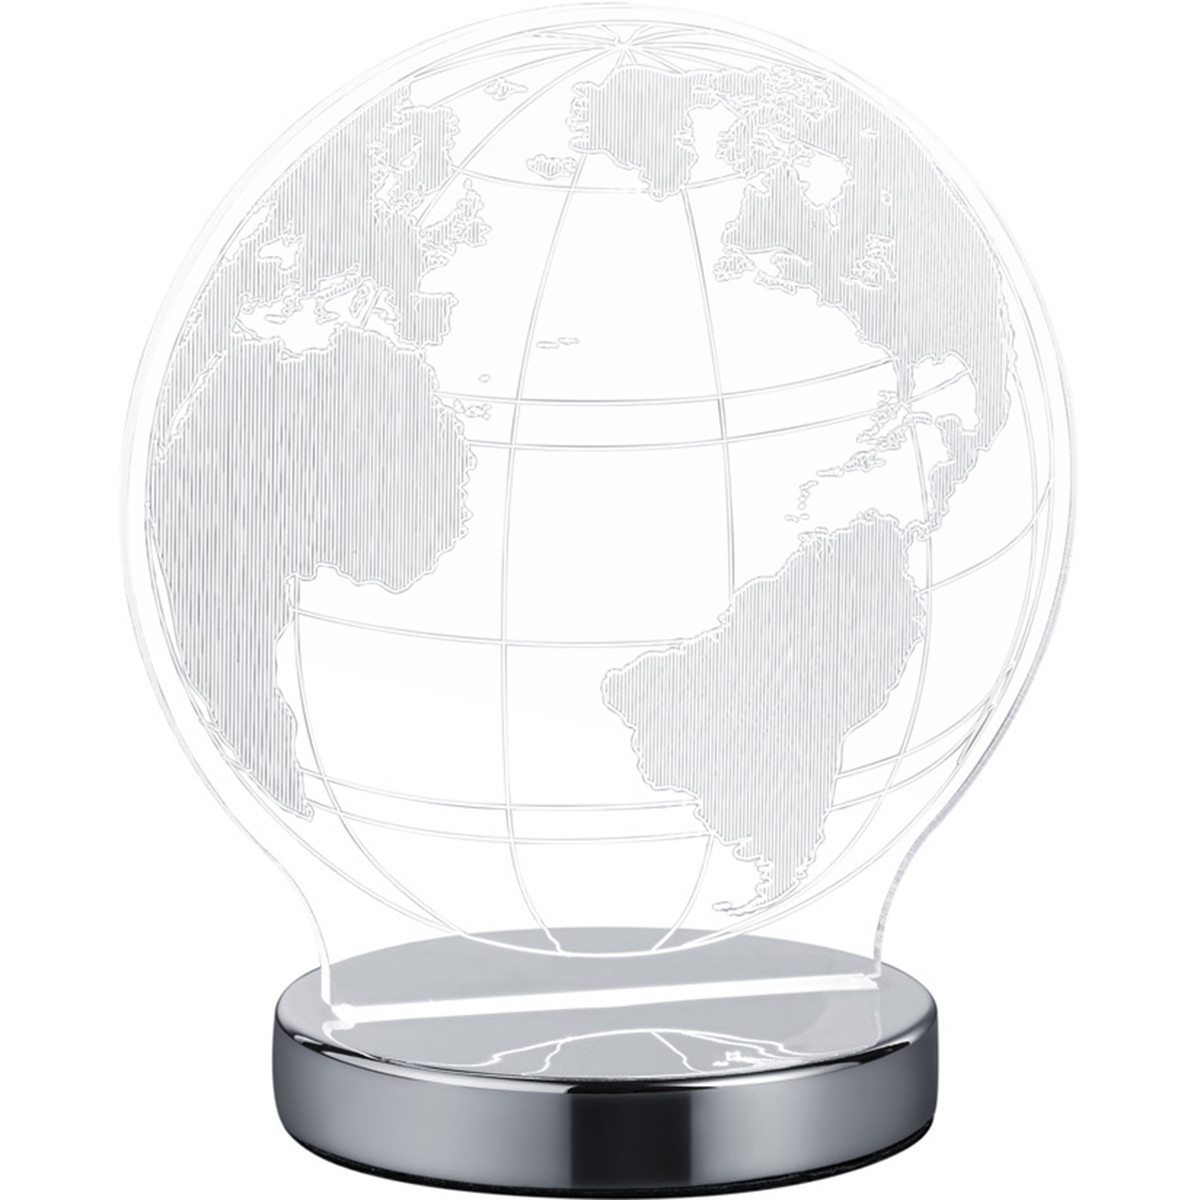 LED Tafellamp - Tafelverlichting - Trion Globin - 7W - Aanpasbare Kleur - Rond - Mat Chroom - Aluminium